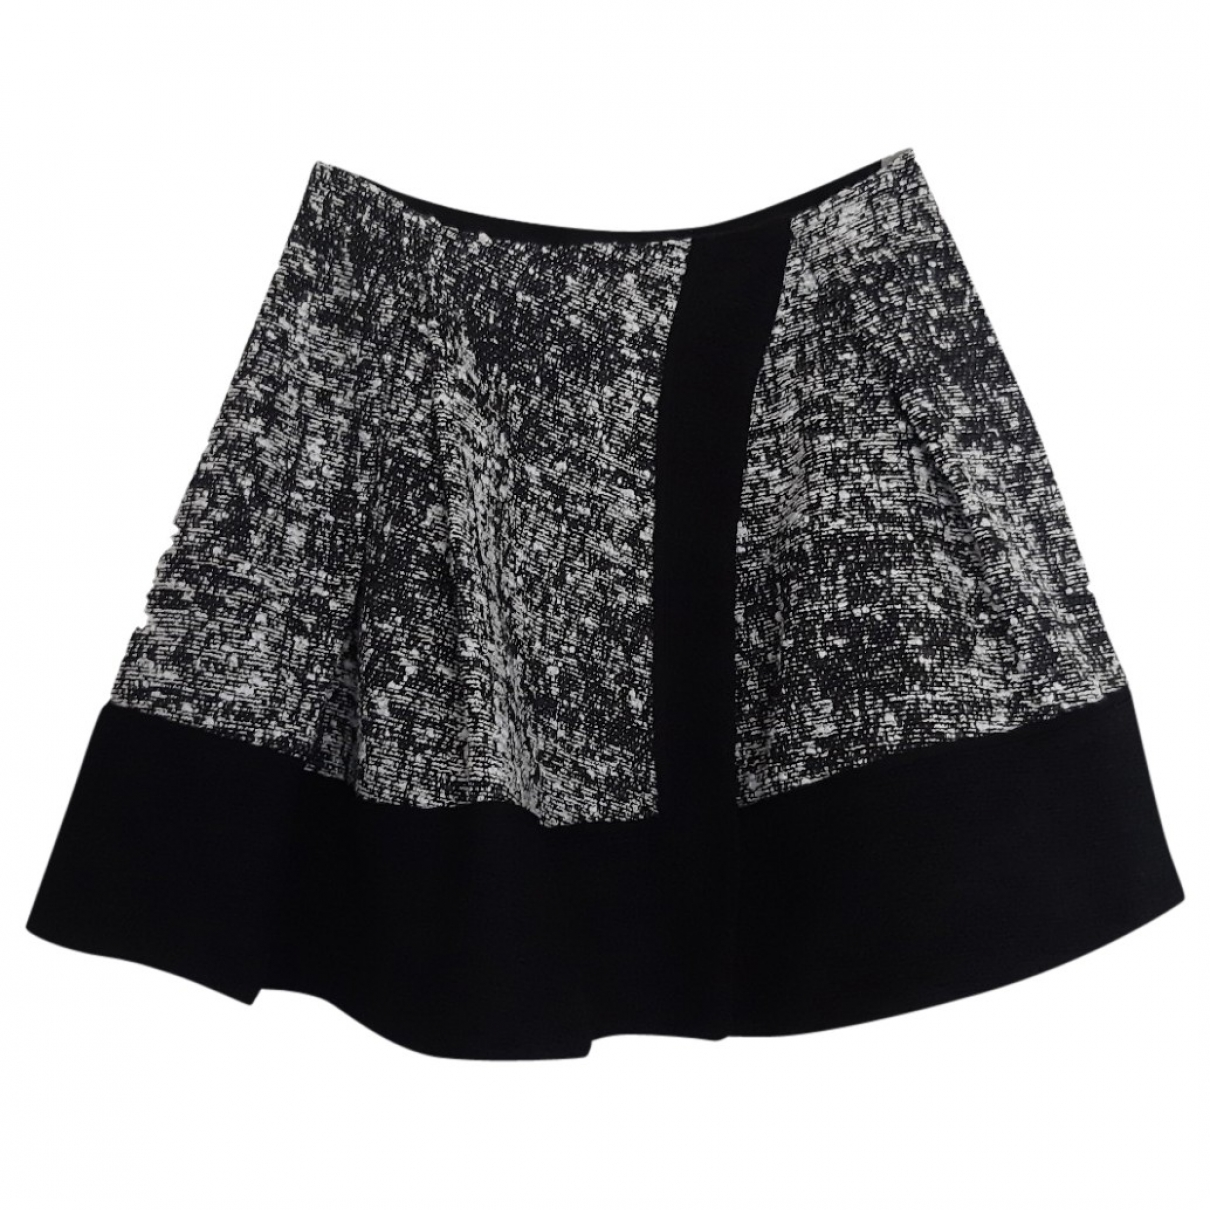 Proenza Schouler \N Black Tweed skirt for Women 4 US